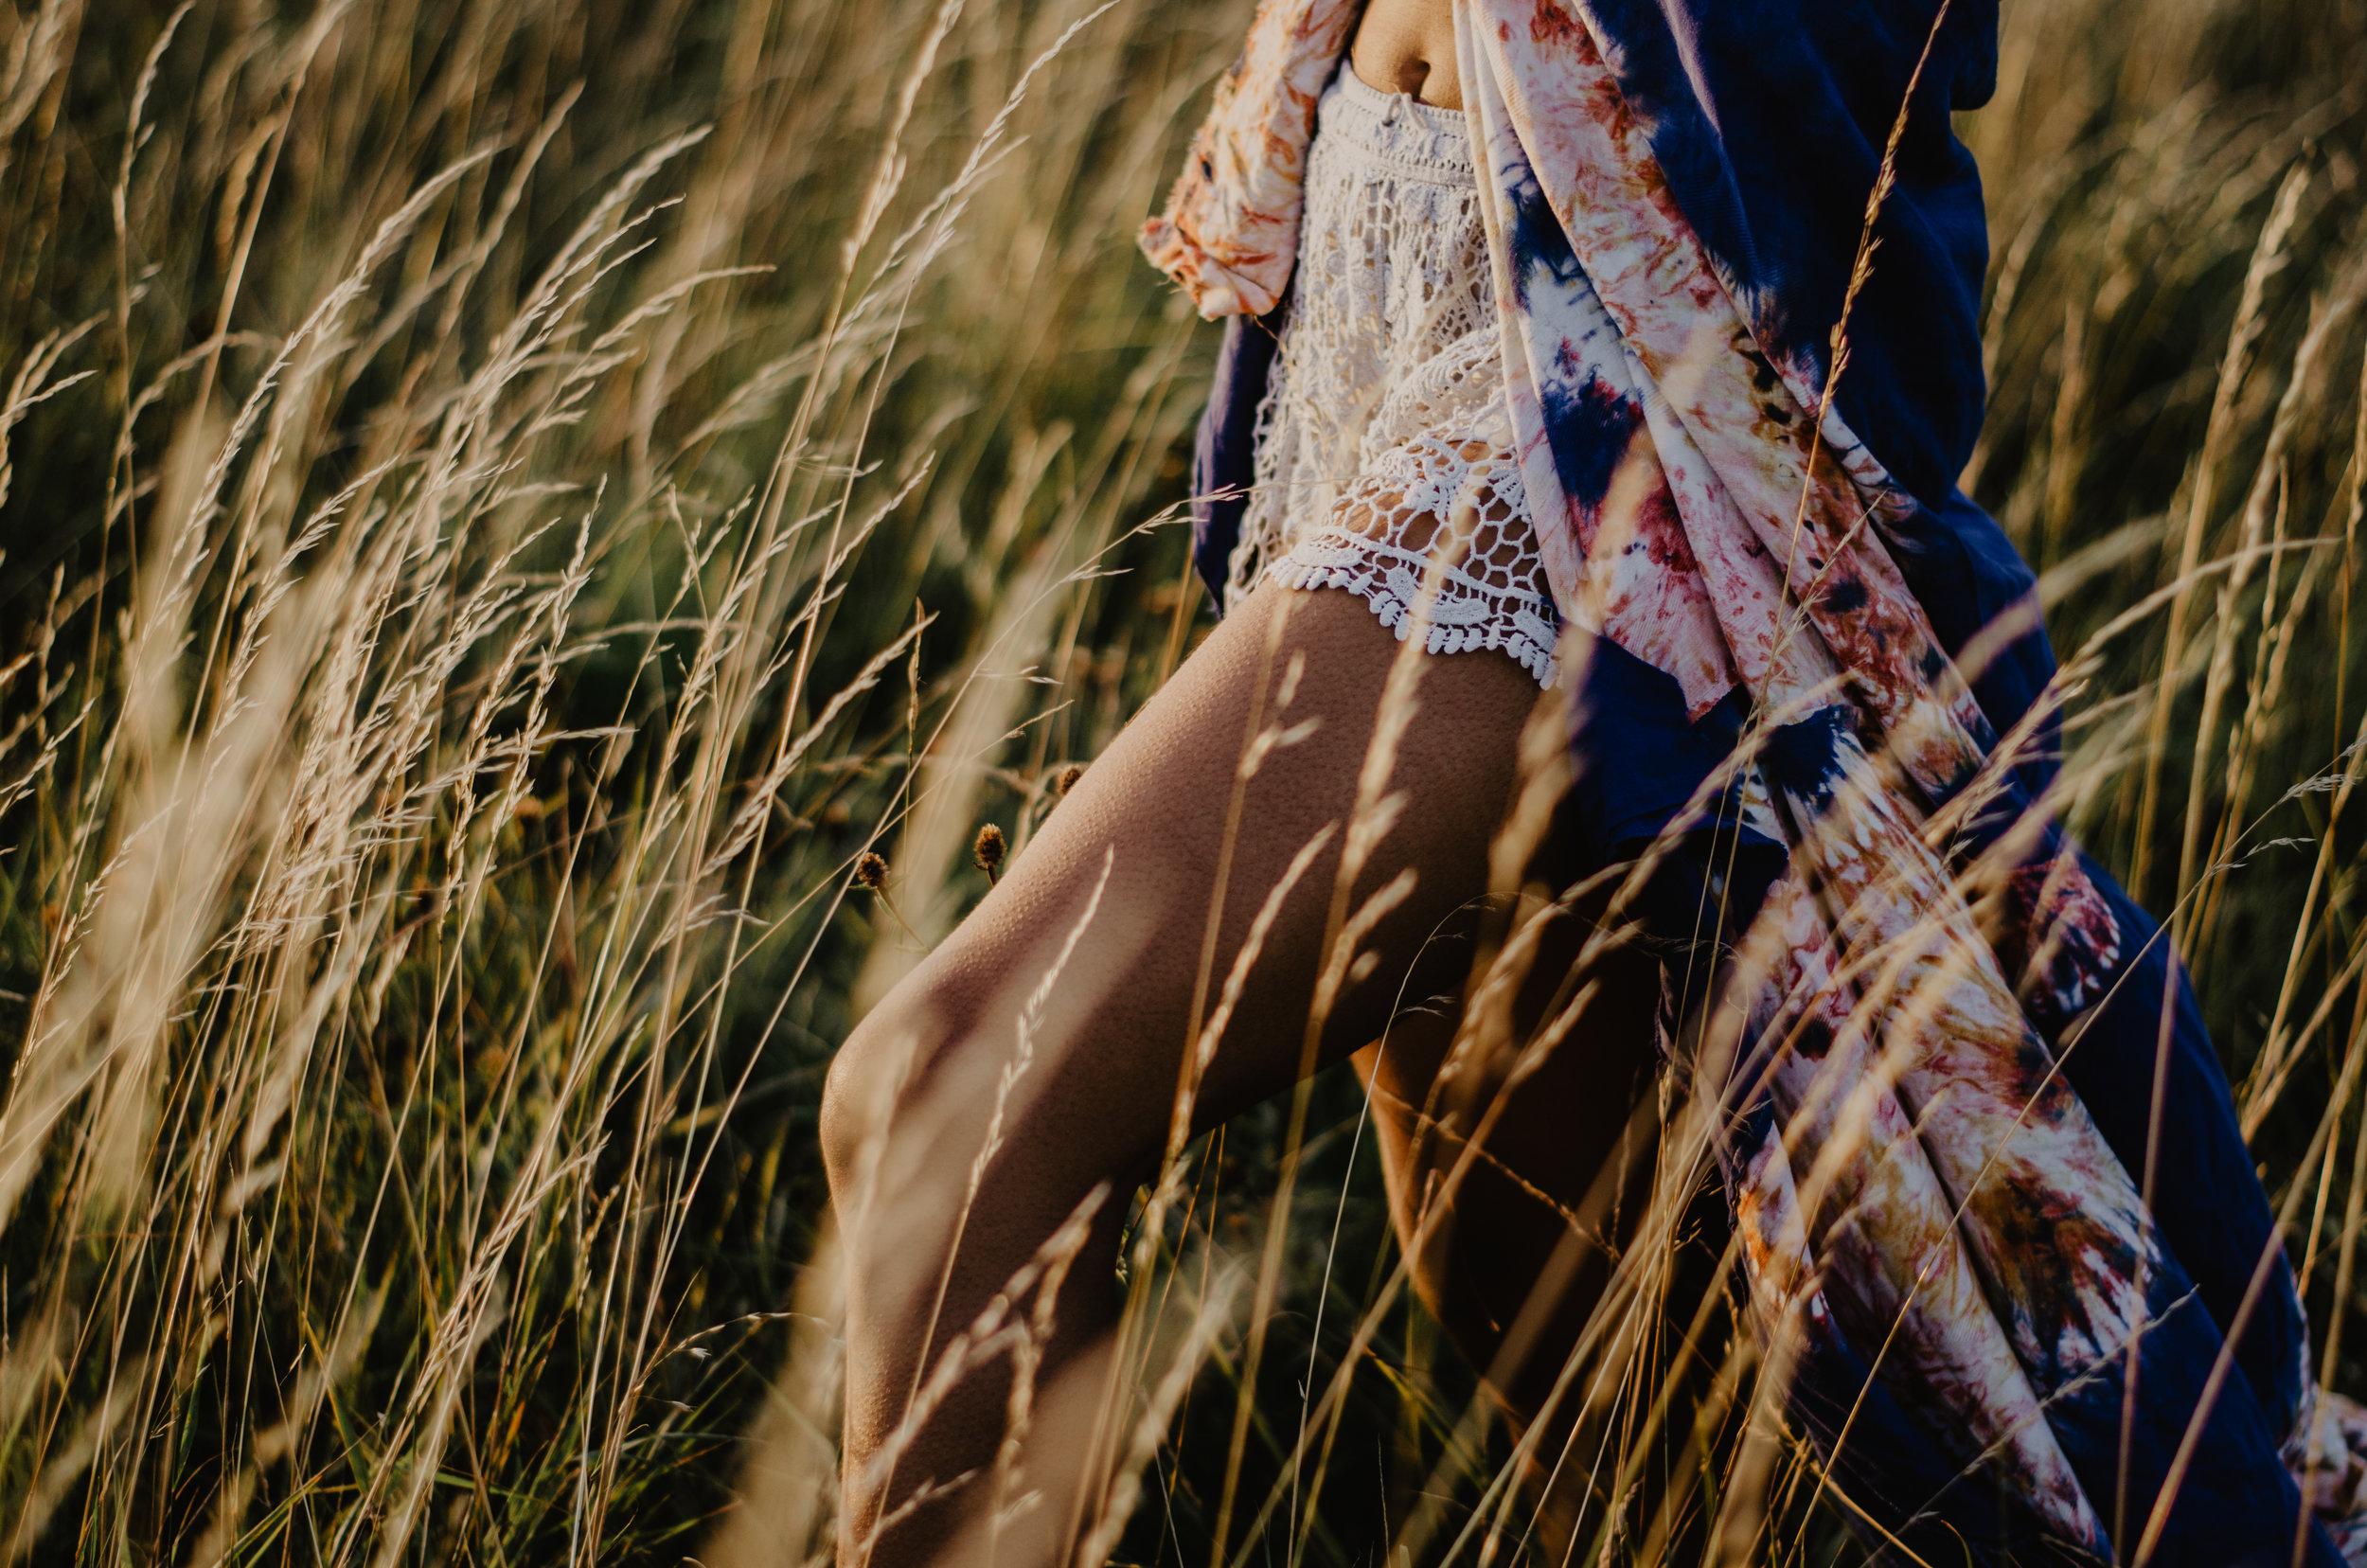 Inka-Portrait-Session-Aiste-Saulyte-Photography-17-07-30-486.jpg